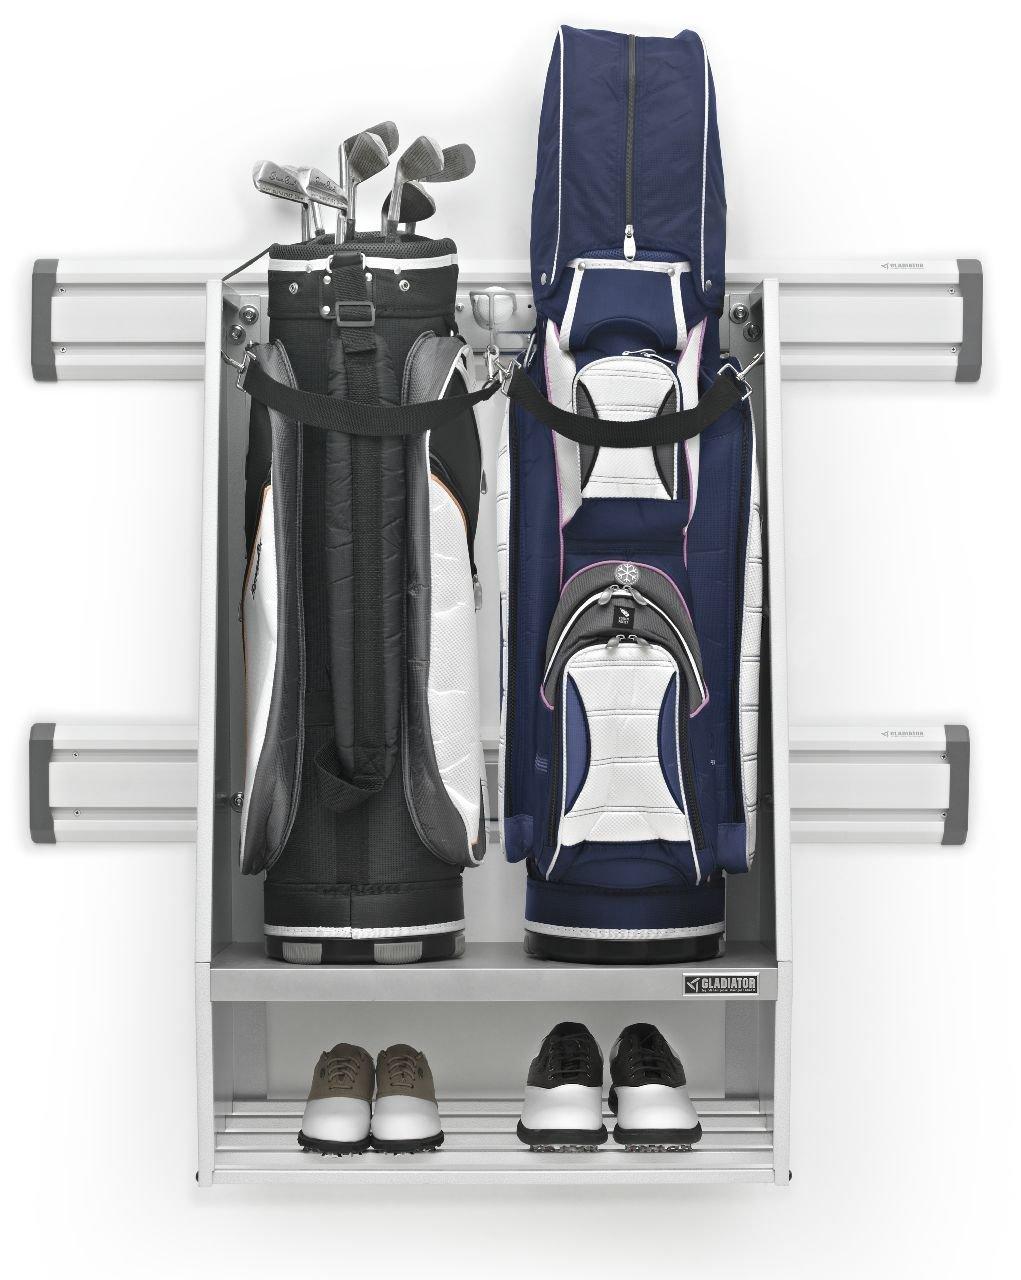 Attractive Gladiator GarageWorks GAWUXXGFTG Golf Caddy   Garage Storage And  Organization System Attachments   Amazon.com